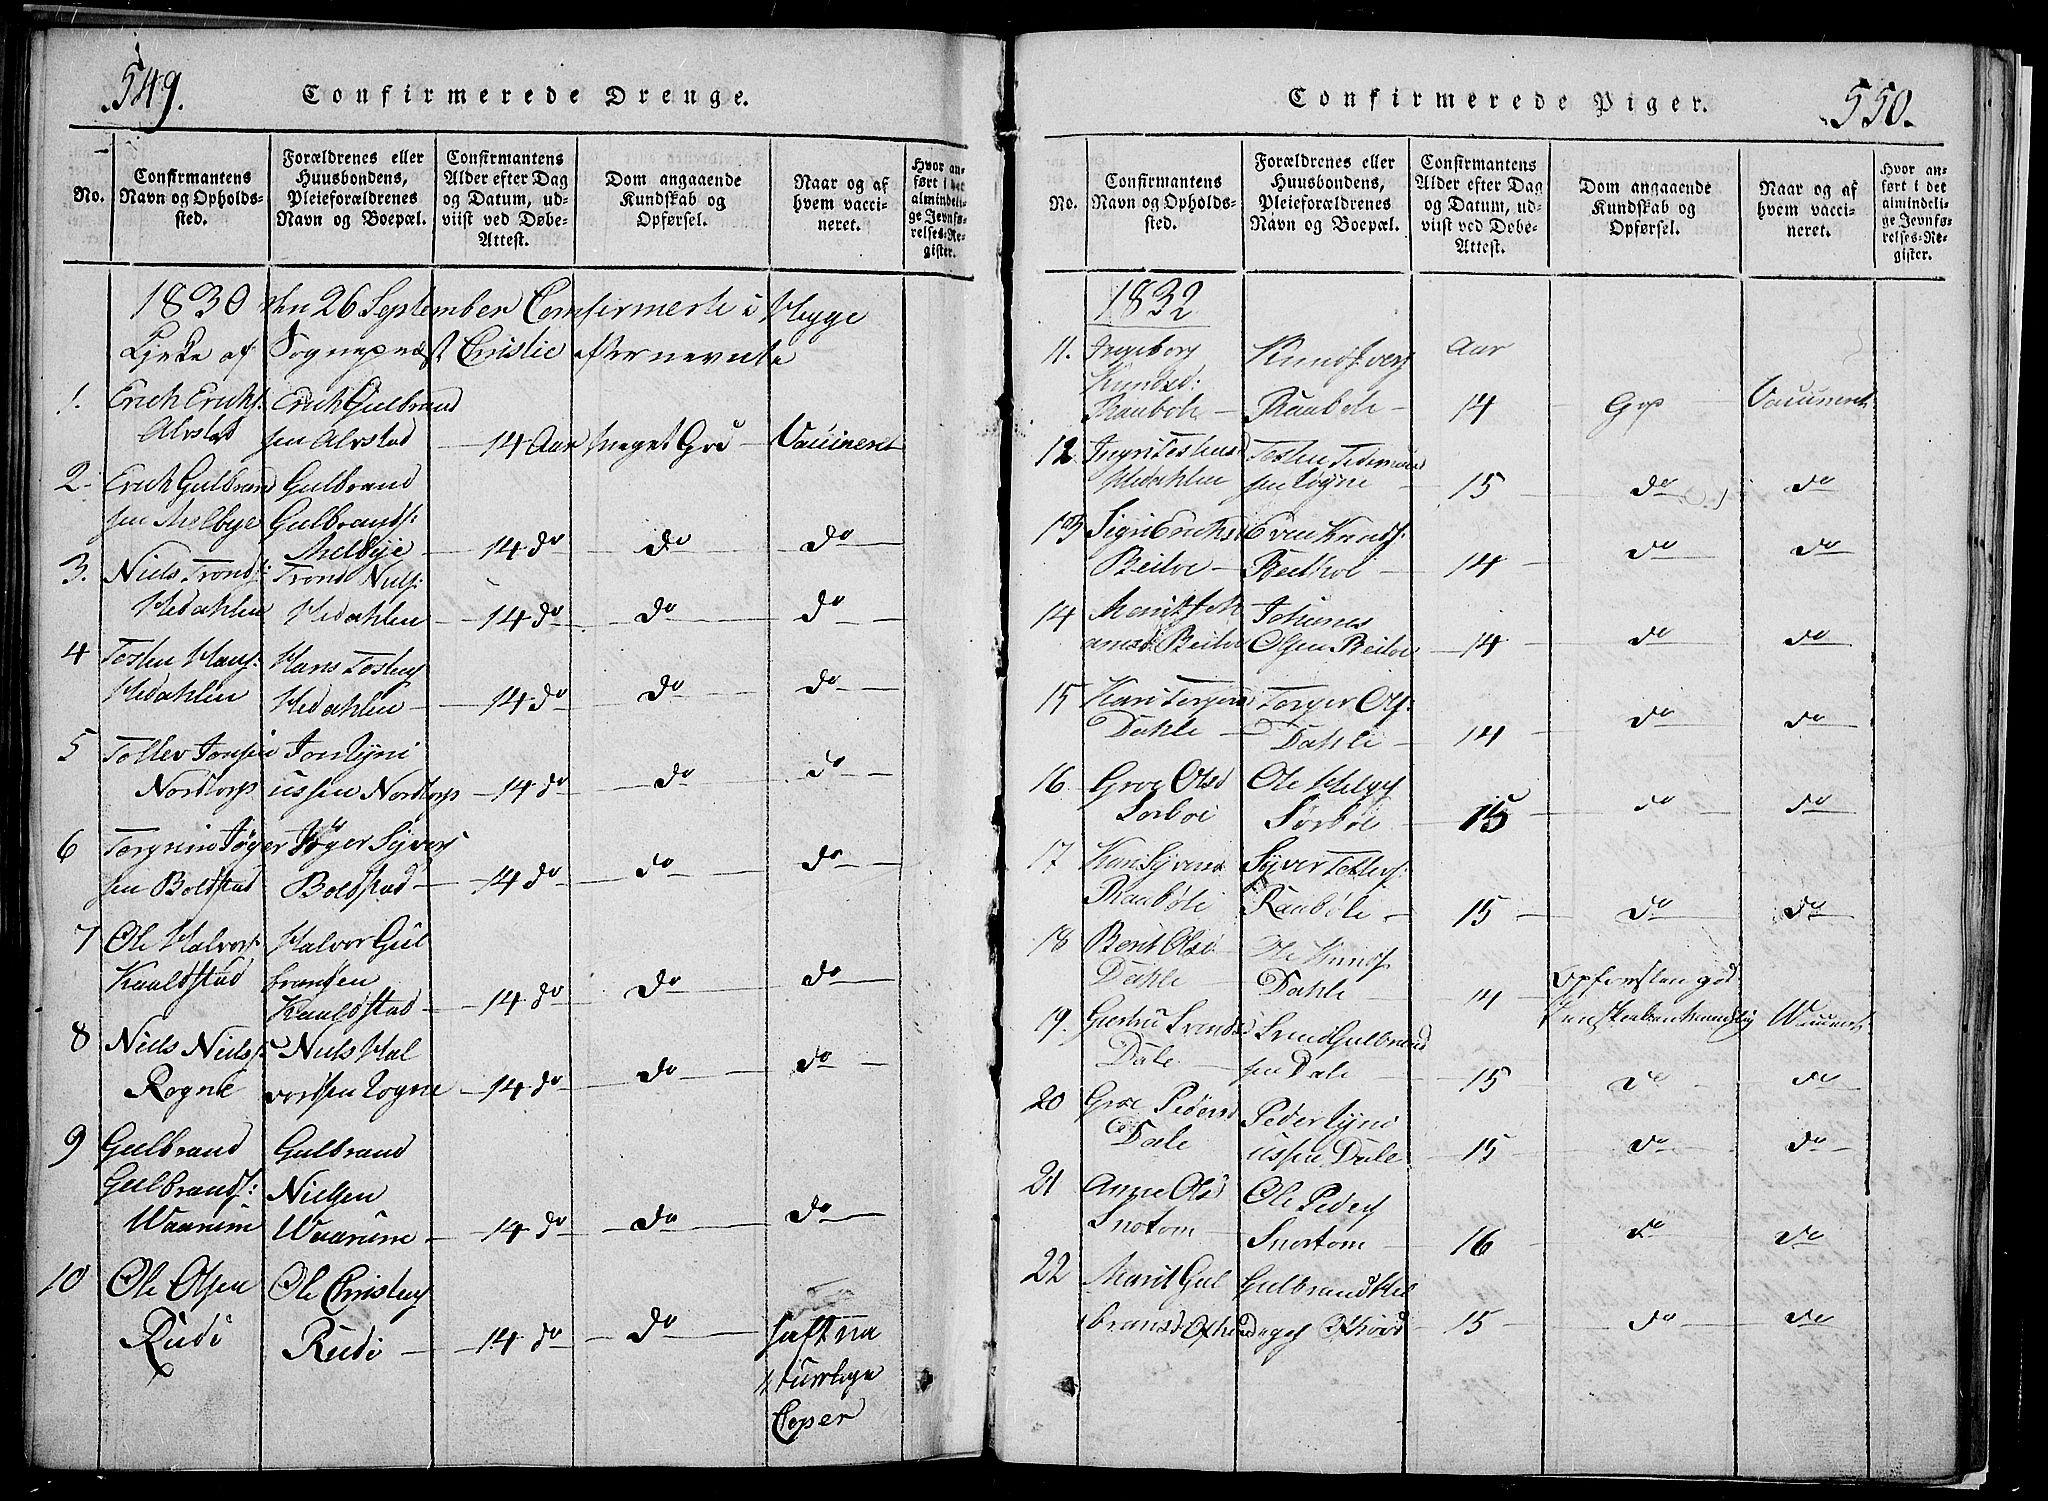 SAH, Slidre prestekontor, Klokkerbok nr. 2, 1814-1839, s. 549-550